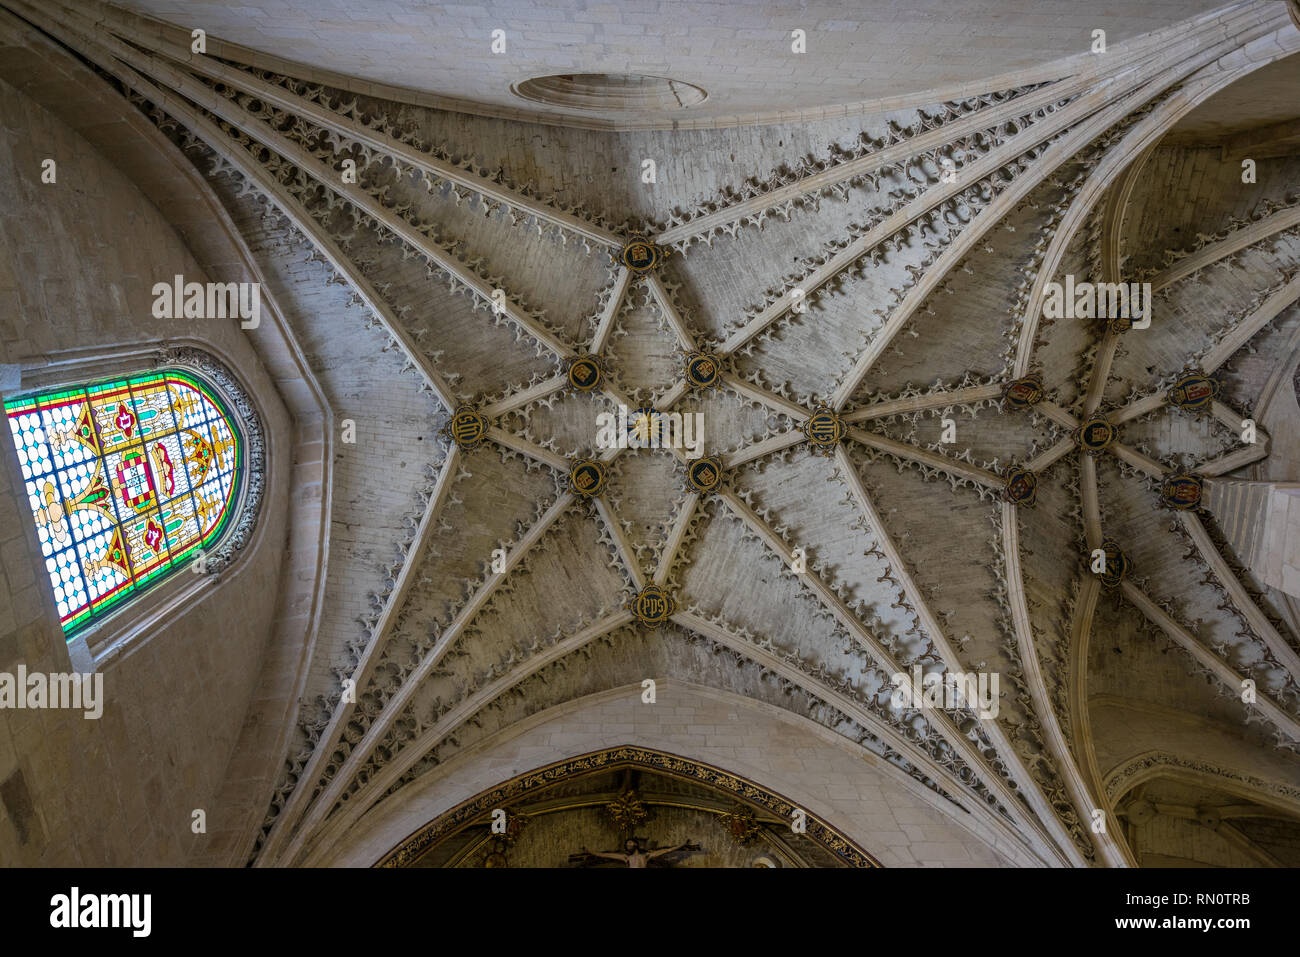 Burgos, Spain - March 24, 2017. Tierceron star vaulted ceiling at Saint Anne Chapel or Chapel of the Conception (Capilla de Santa Ana o de la concepci - Stock Image